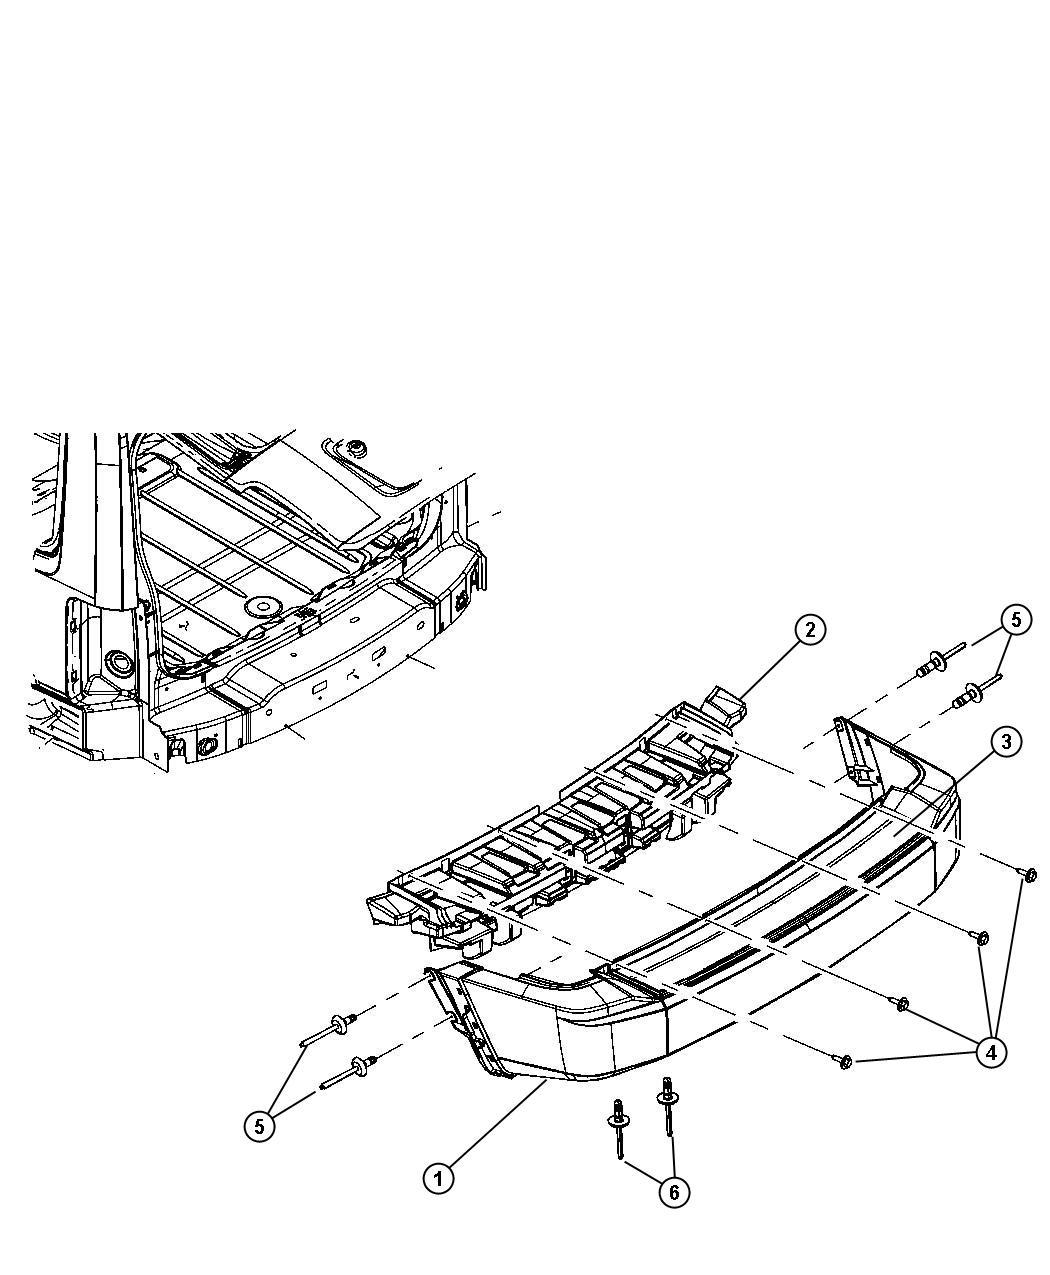 Jeep Liberty Absorber Rear Energy Fasciarear